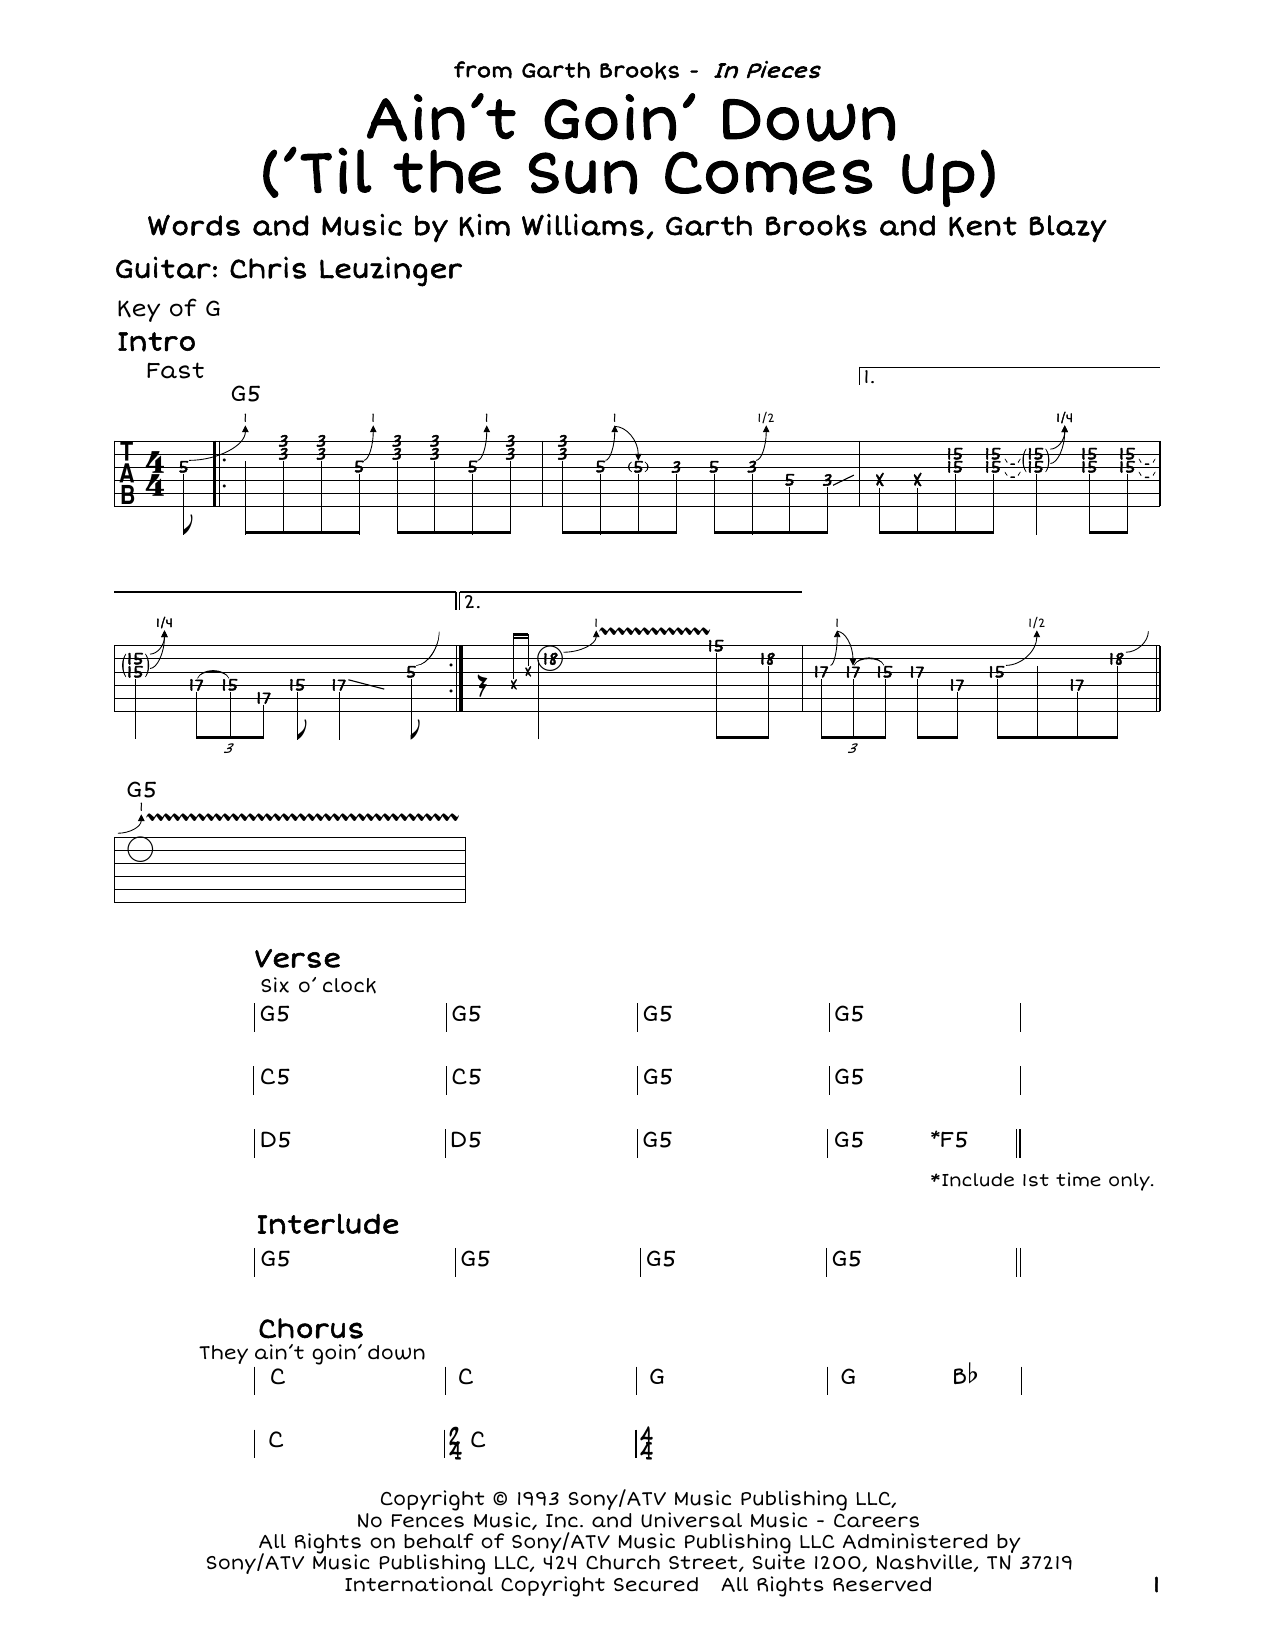 Sheet Music Digital Files To Print Licensed Kent Blazy Digital